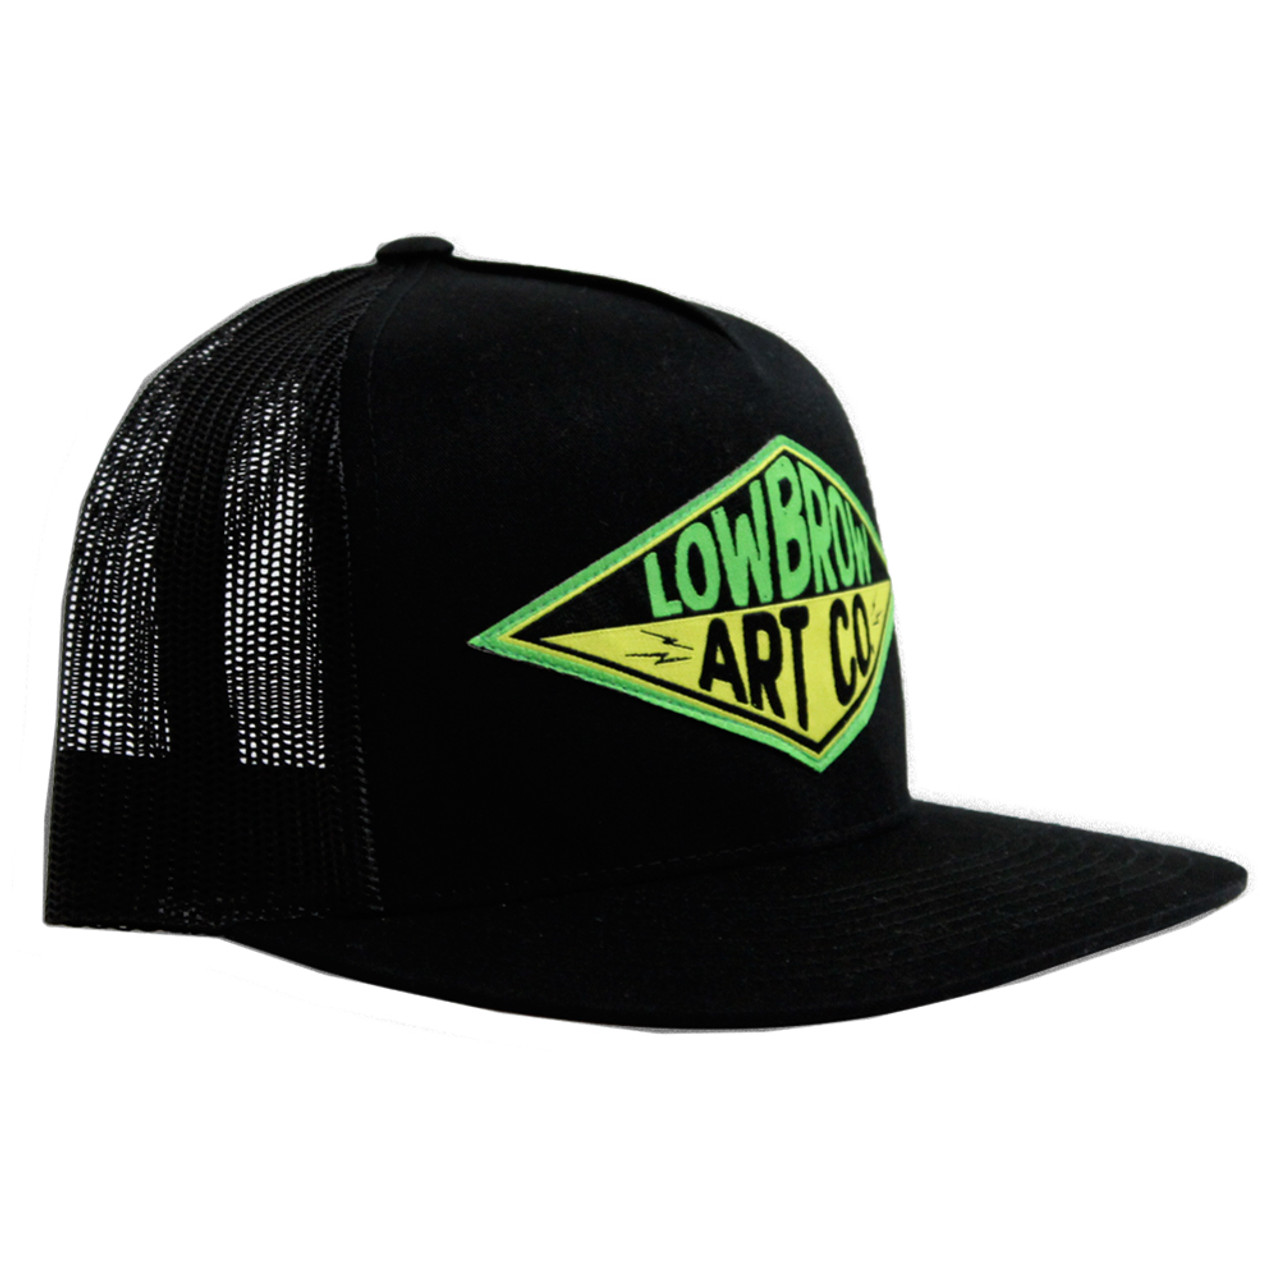 Western Lowbrow Art Snap Back Classic Trucker Hat Black